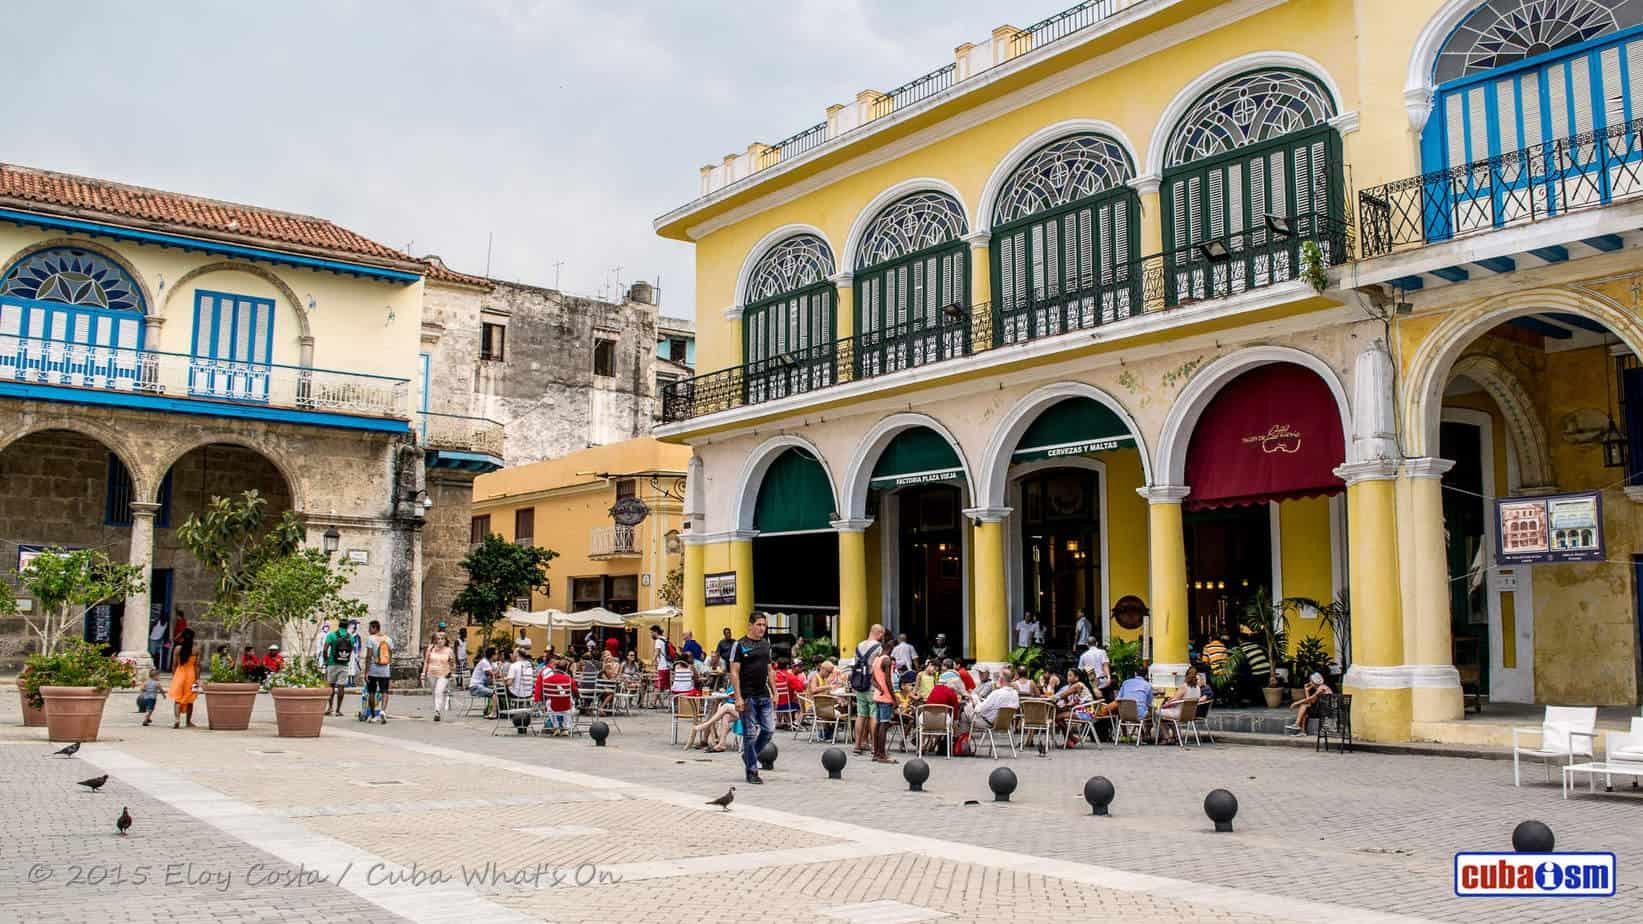 Plaza Vieja de La Habana